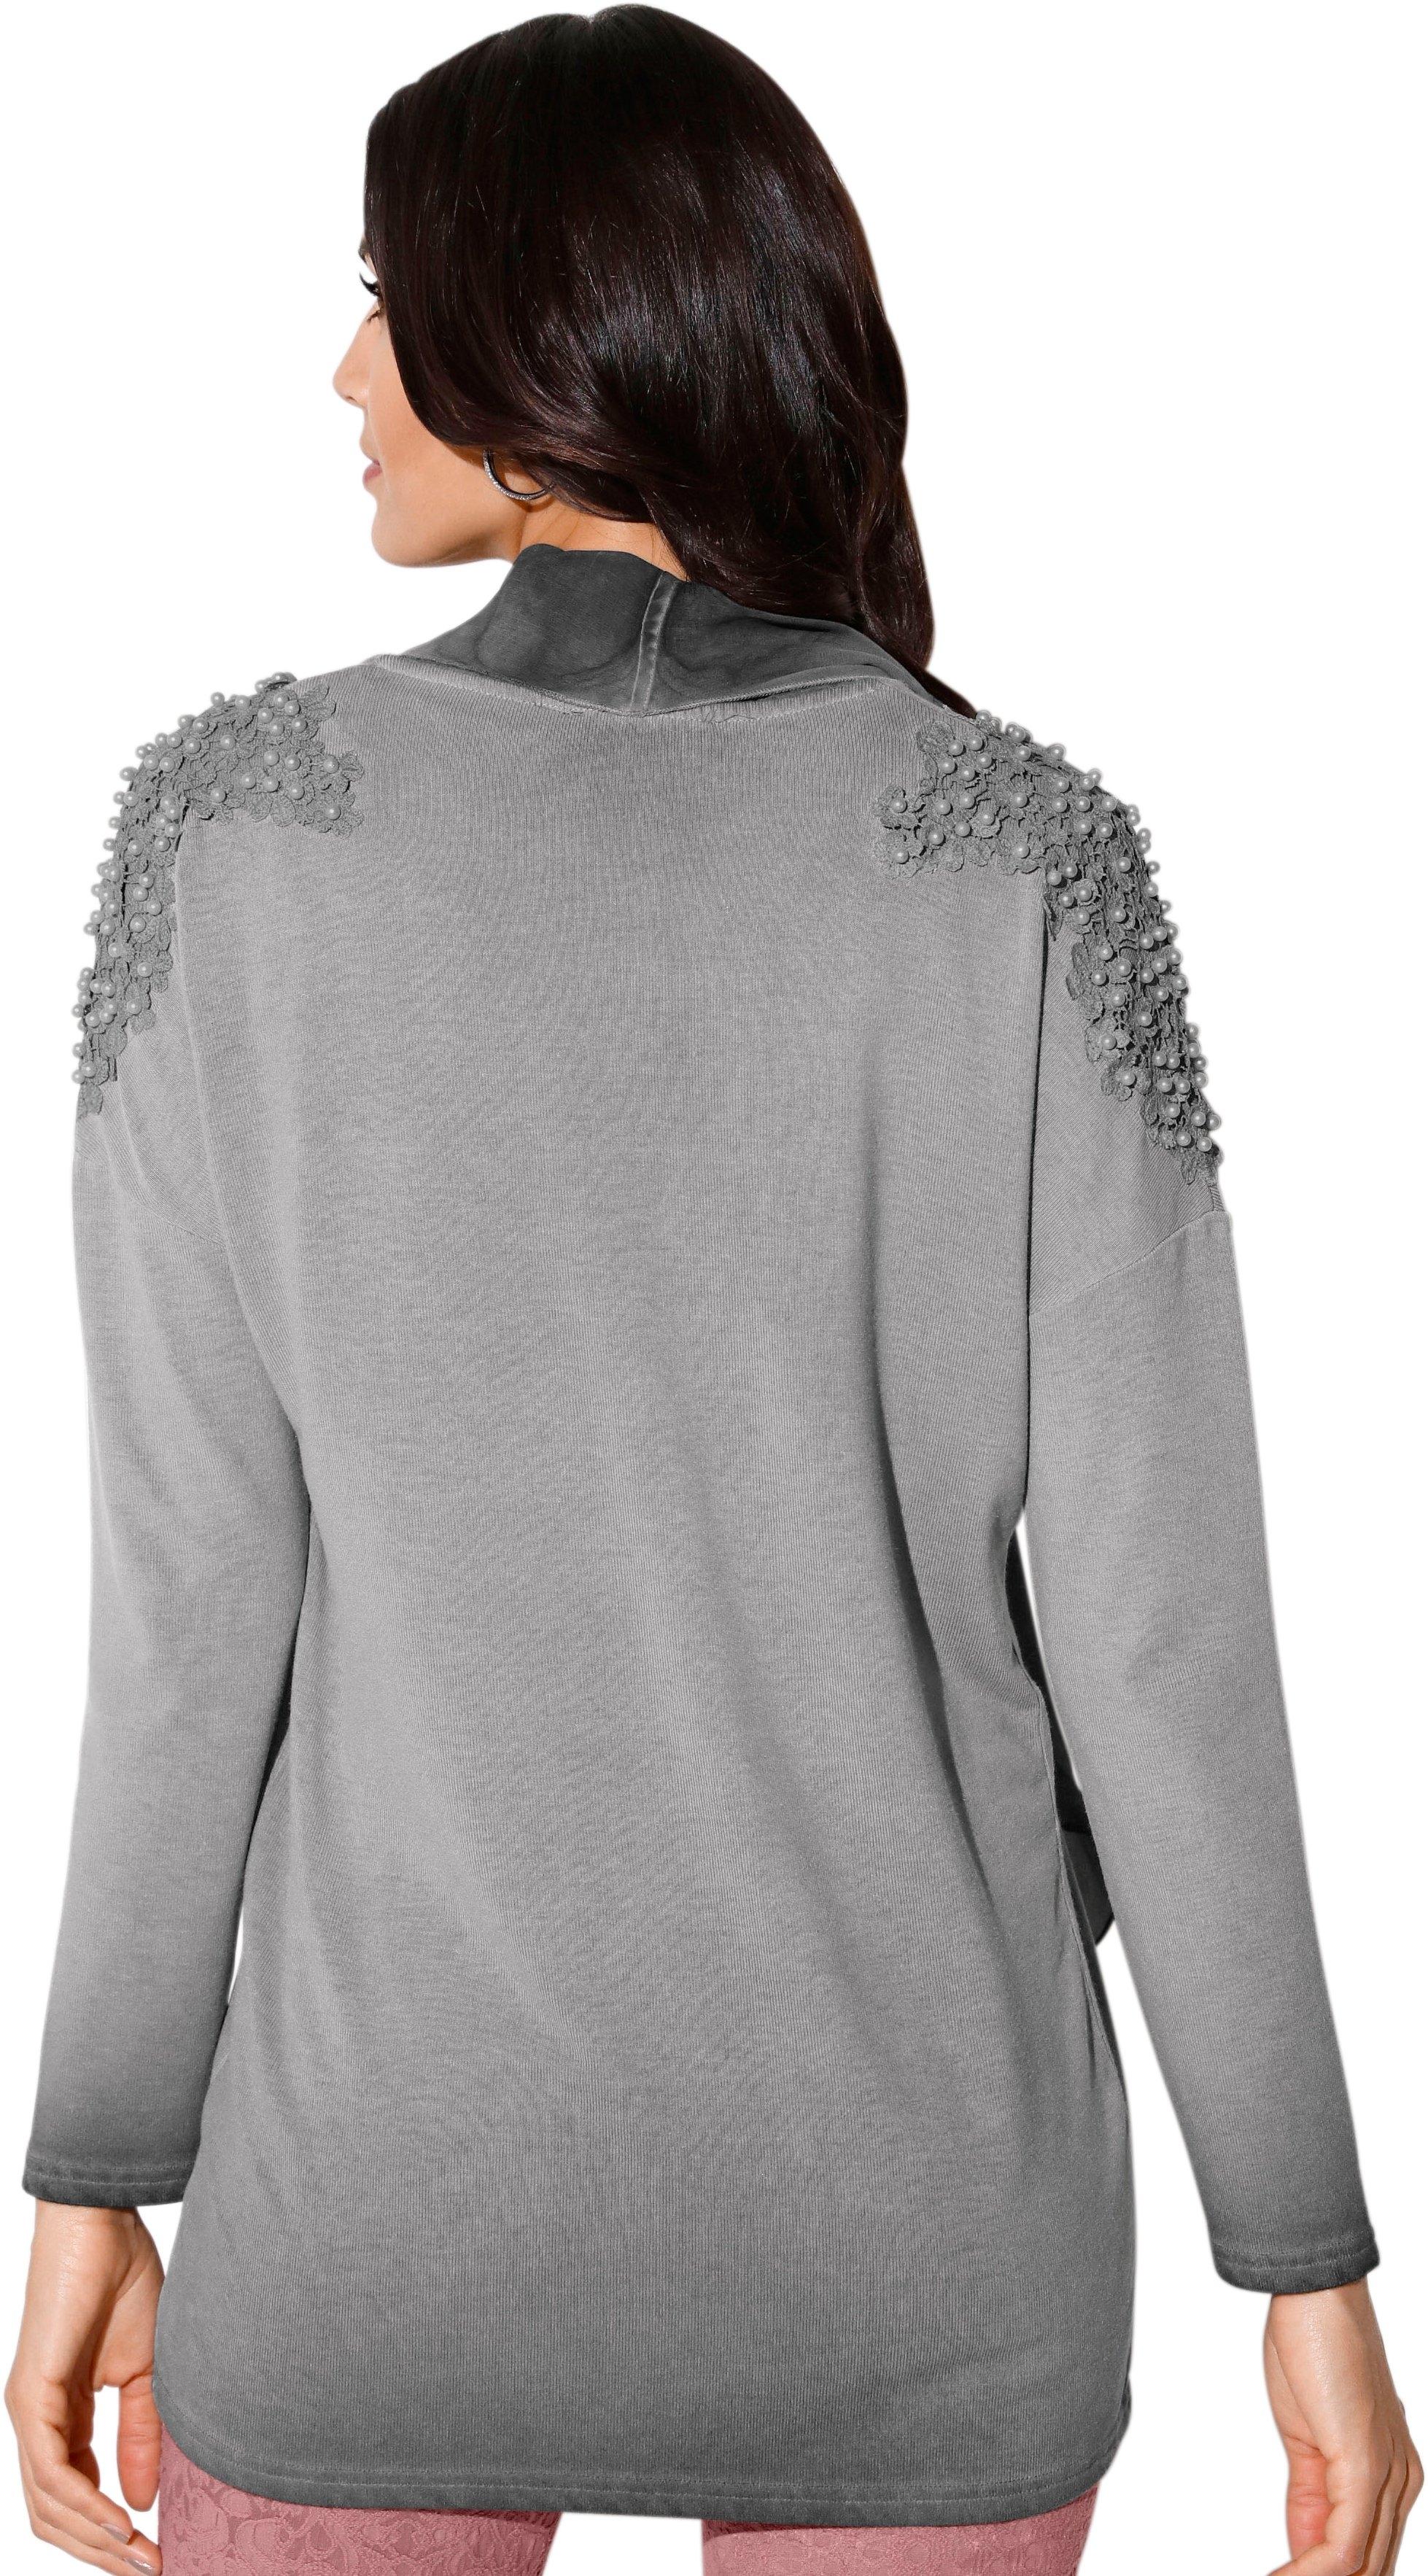 Vest Shop L Met De In Online Chiffon sjaalkraag Création R4qA5L3j